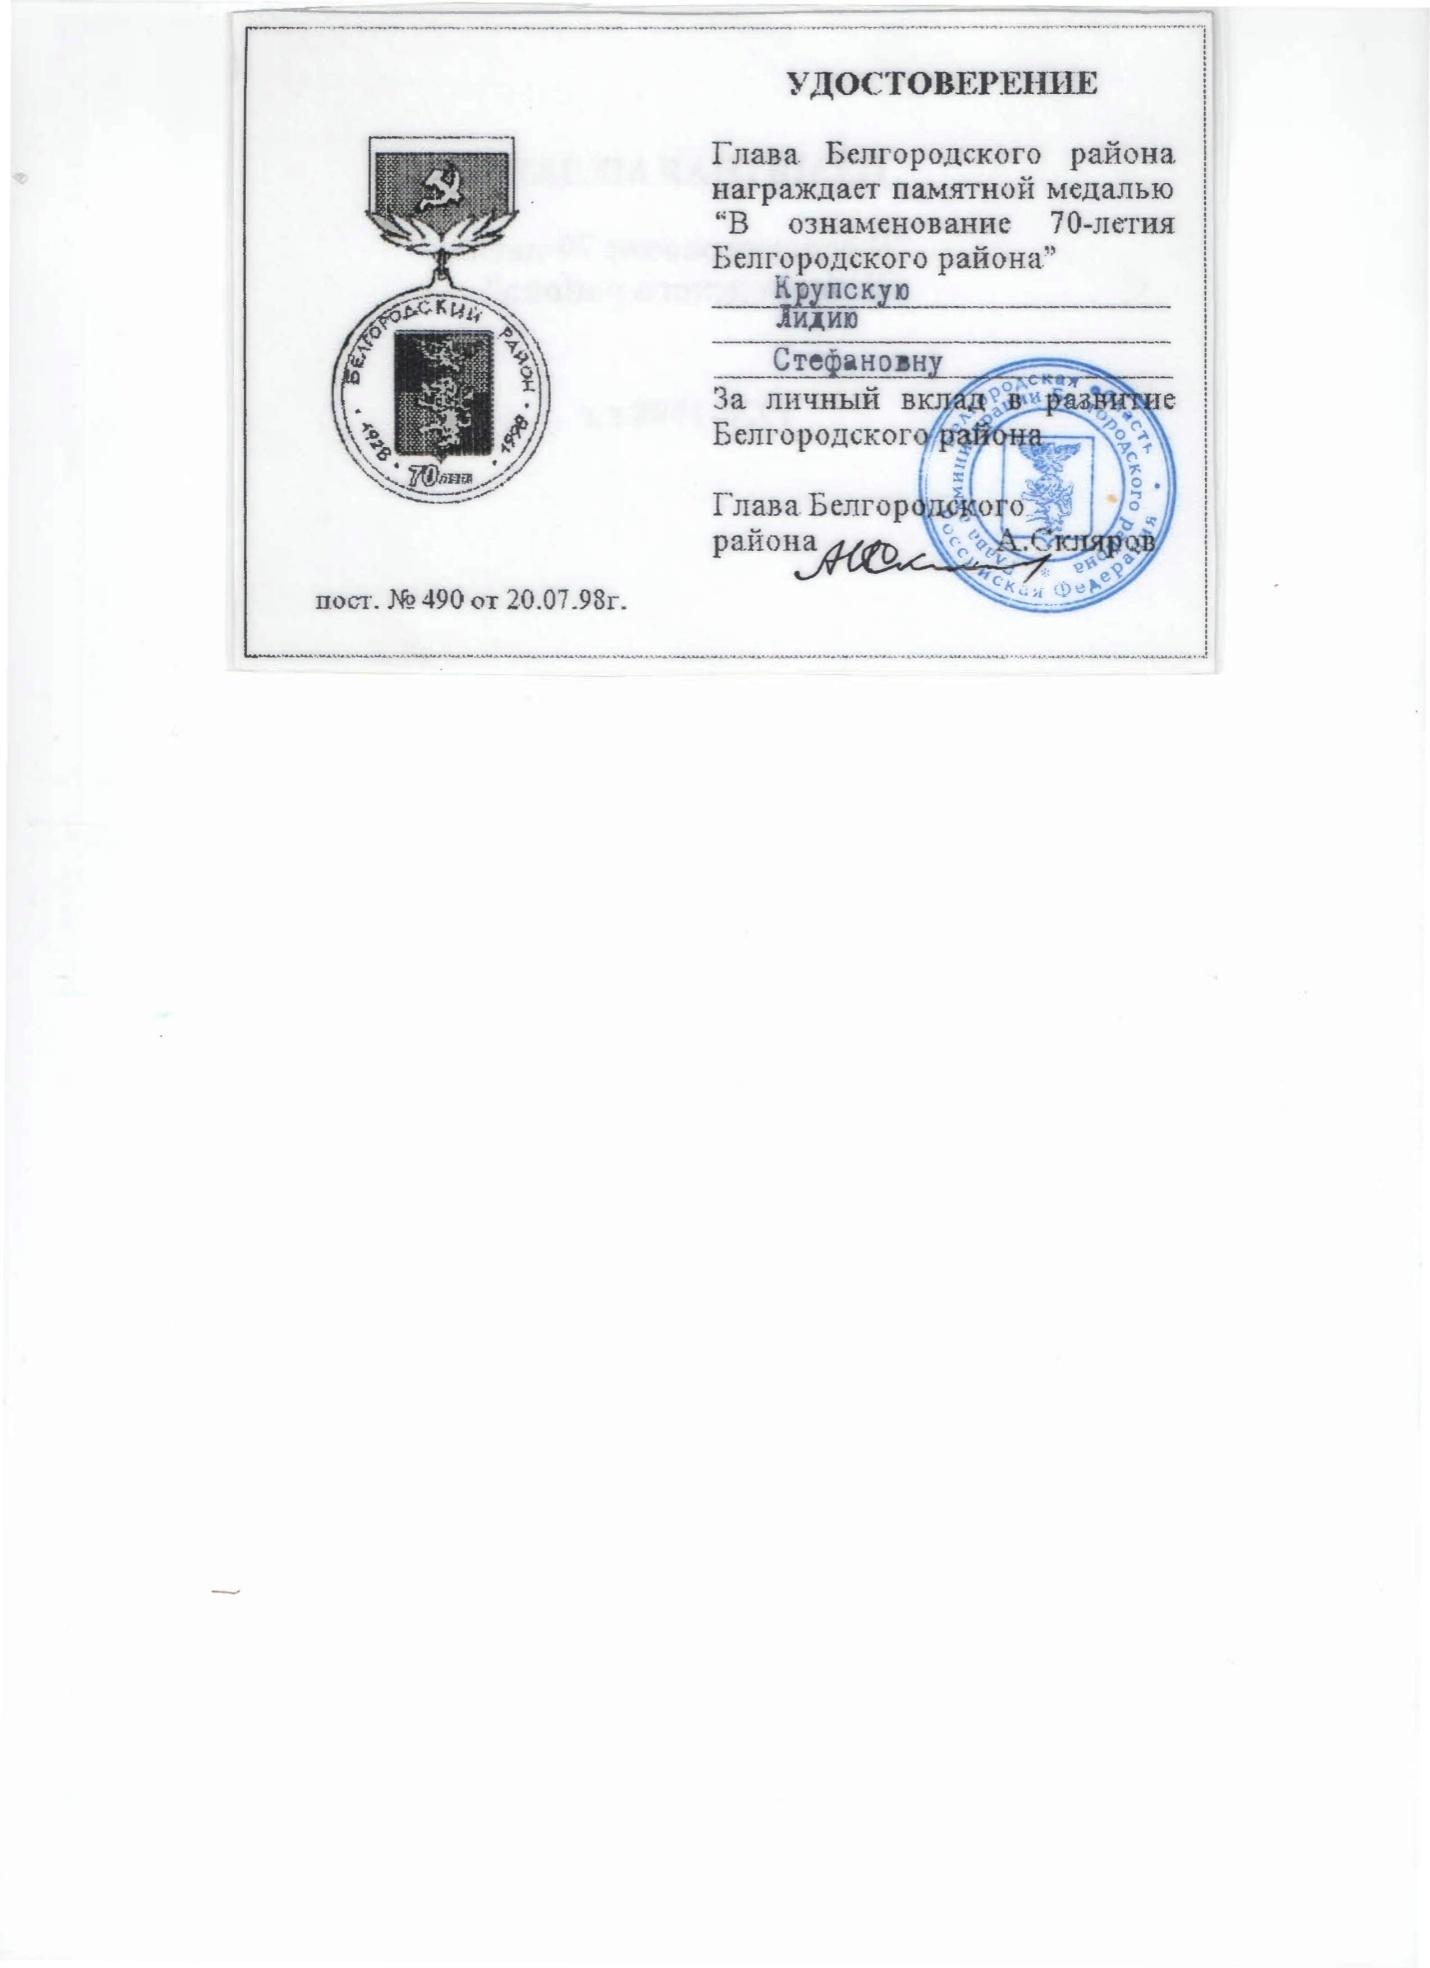 C:\Documents and Settings\Admin\Рабочий стол\Крупская Г.Н\Крупская Лидия Стефановна\16.jpg